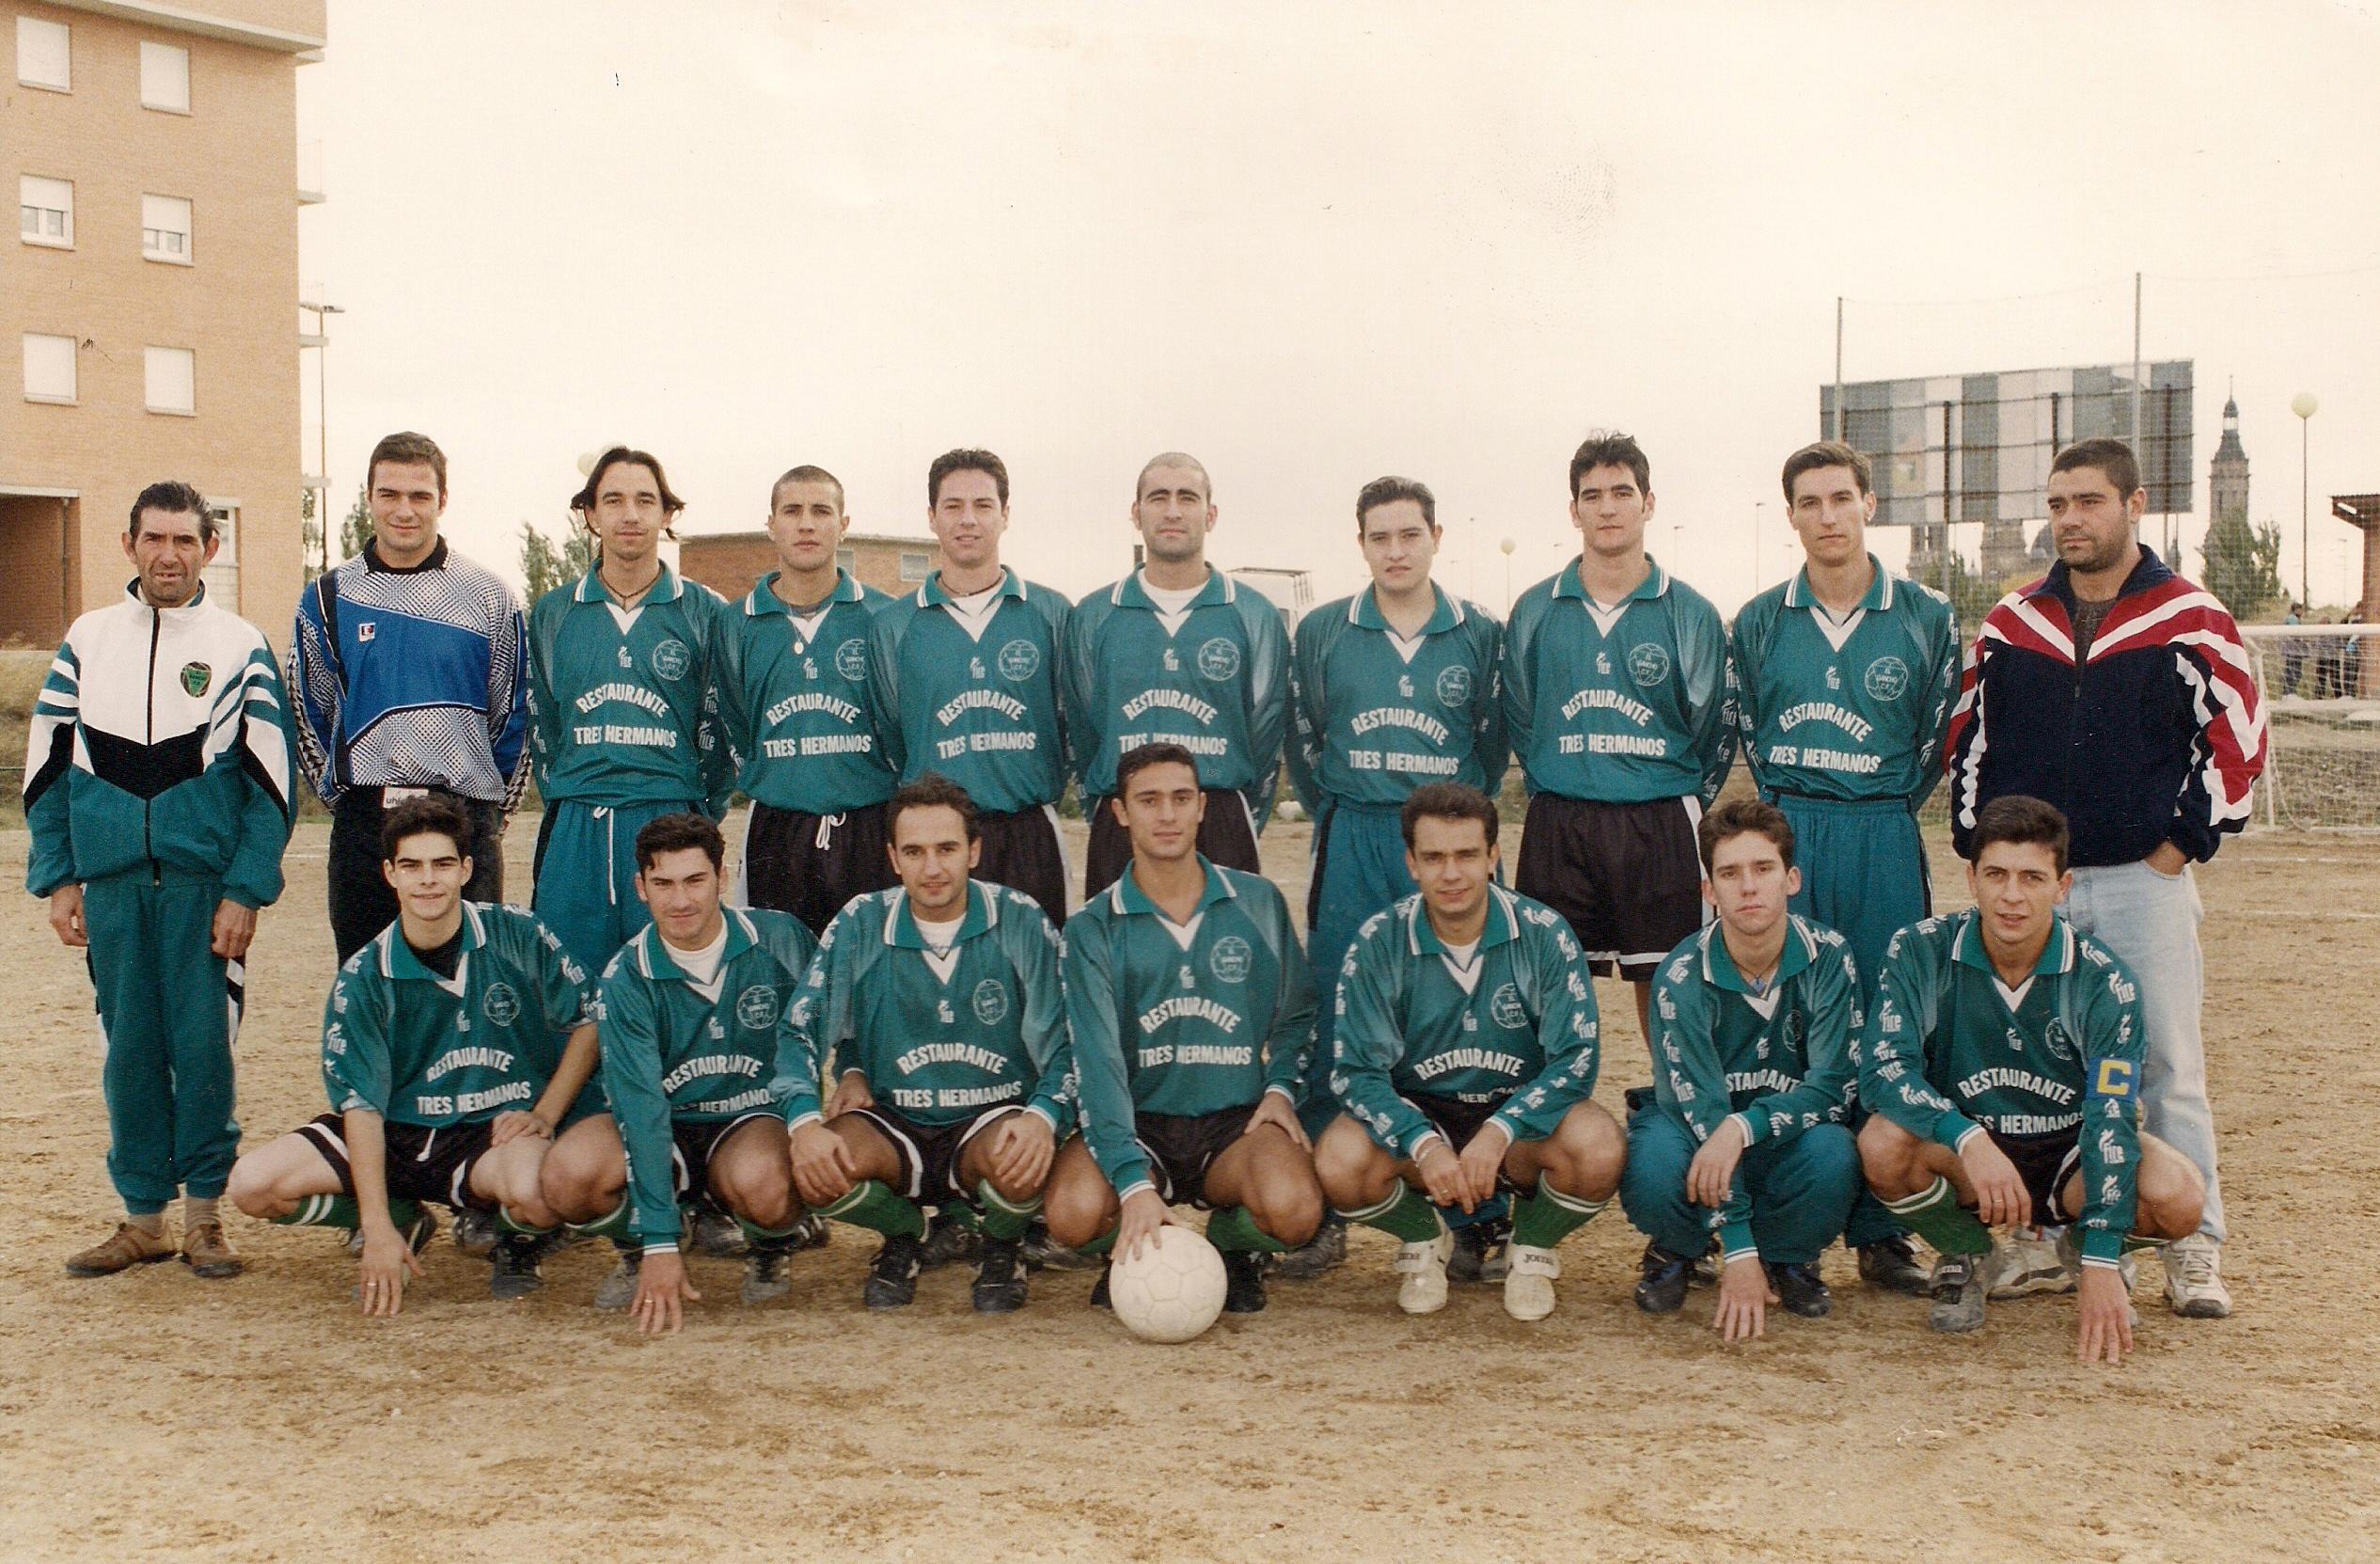 1996-1997 Regional